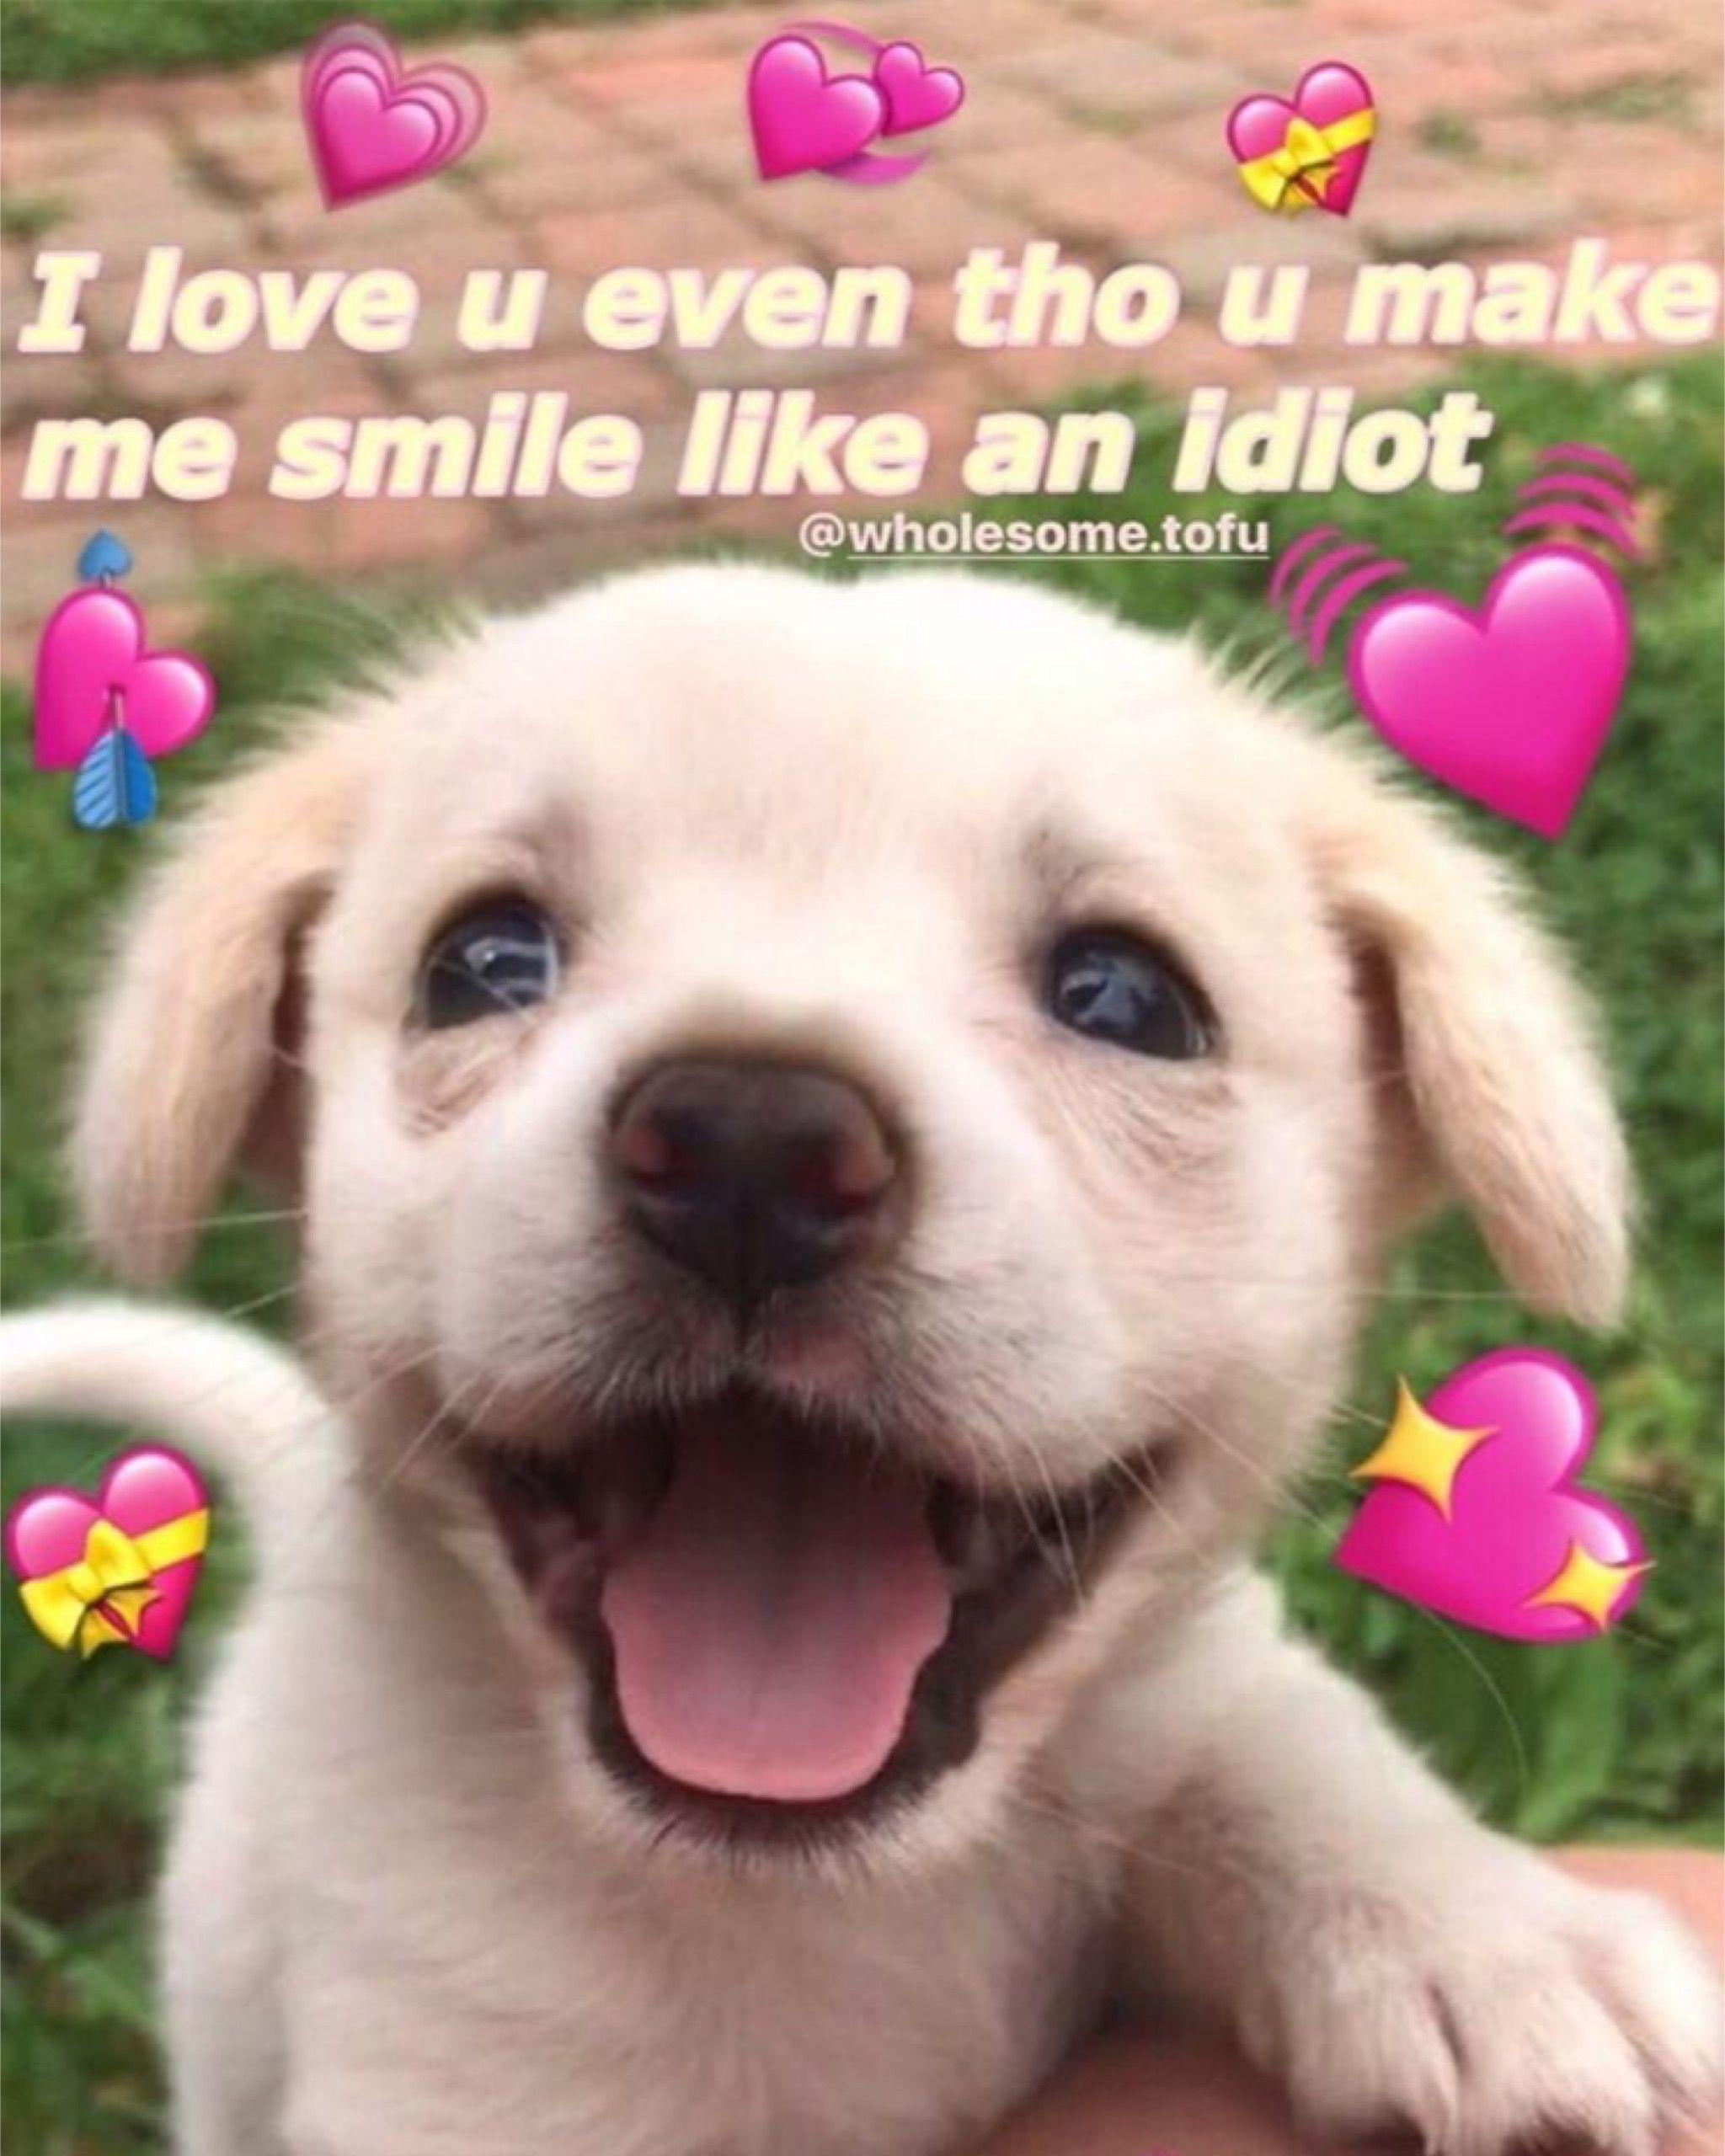 Pin By Jenny On Theooooooooooo 3 Cute Love Memes Cute Memes Love You Meme